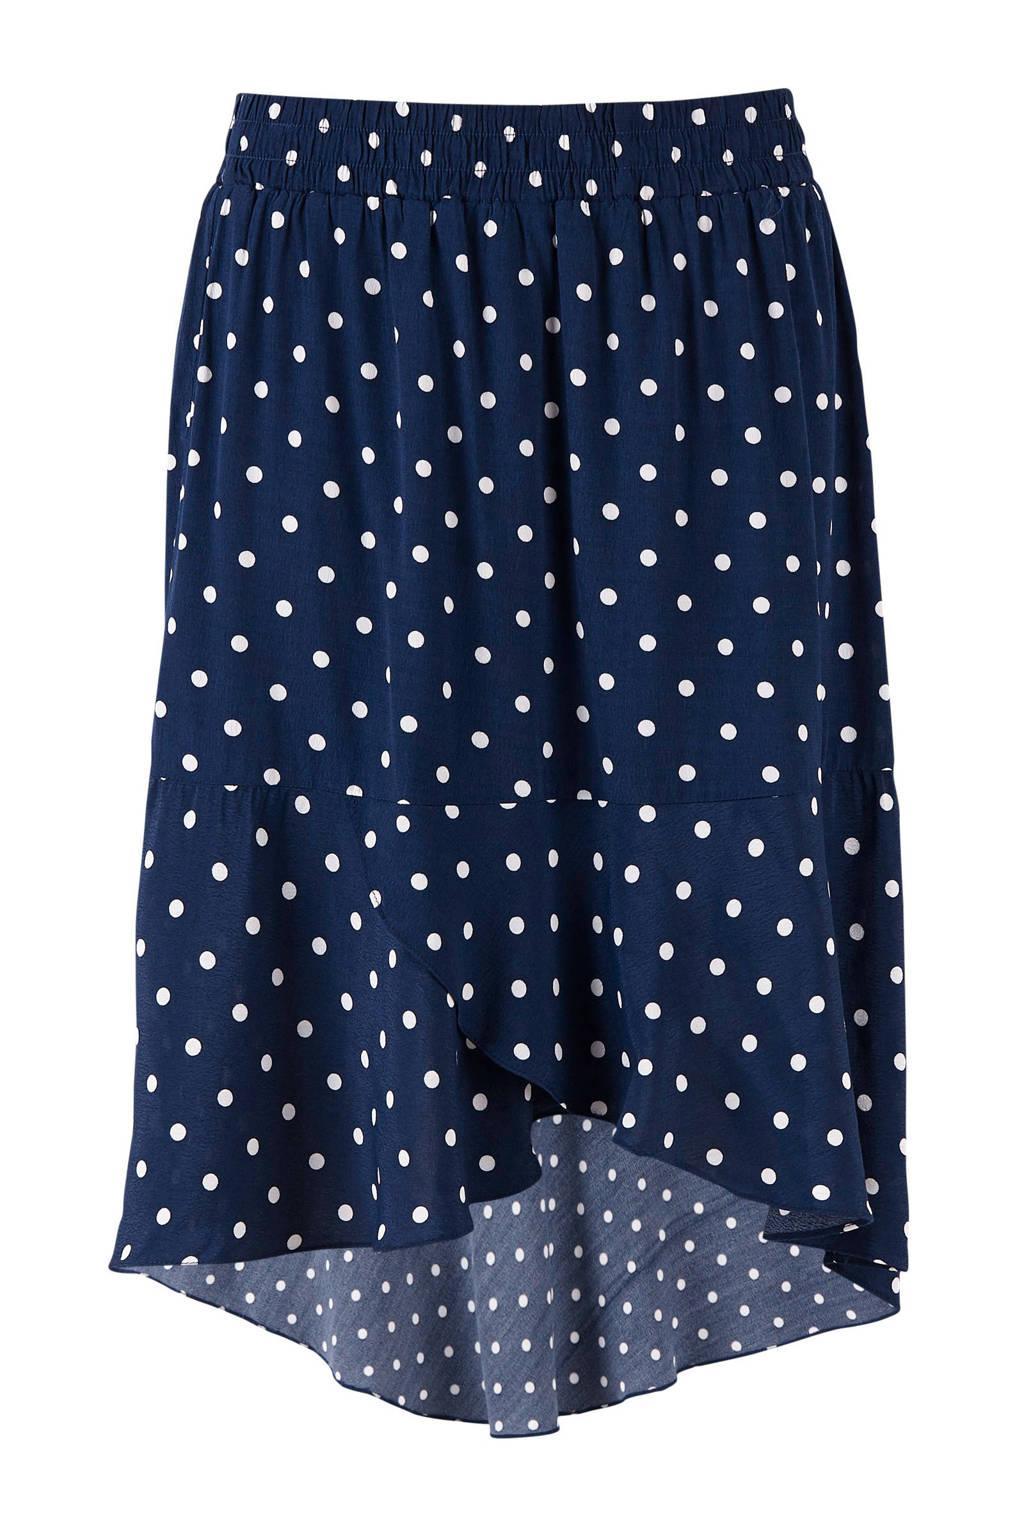 Saint Tropez rok met stippen donkerblauw, Donkerblauw/wit